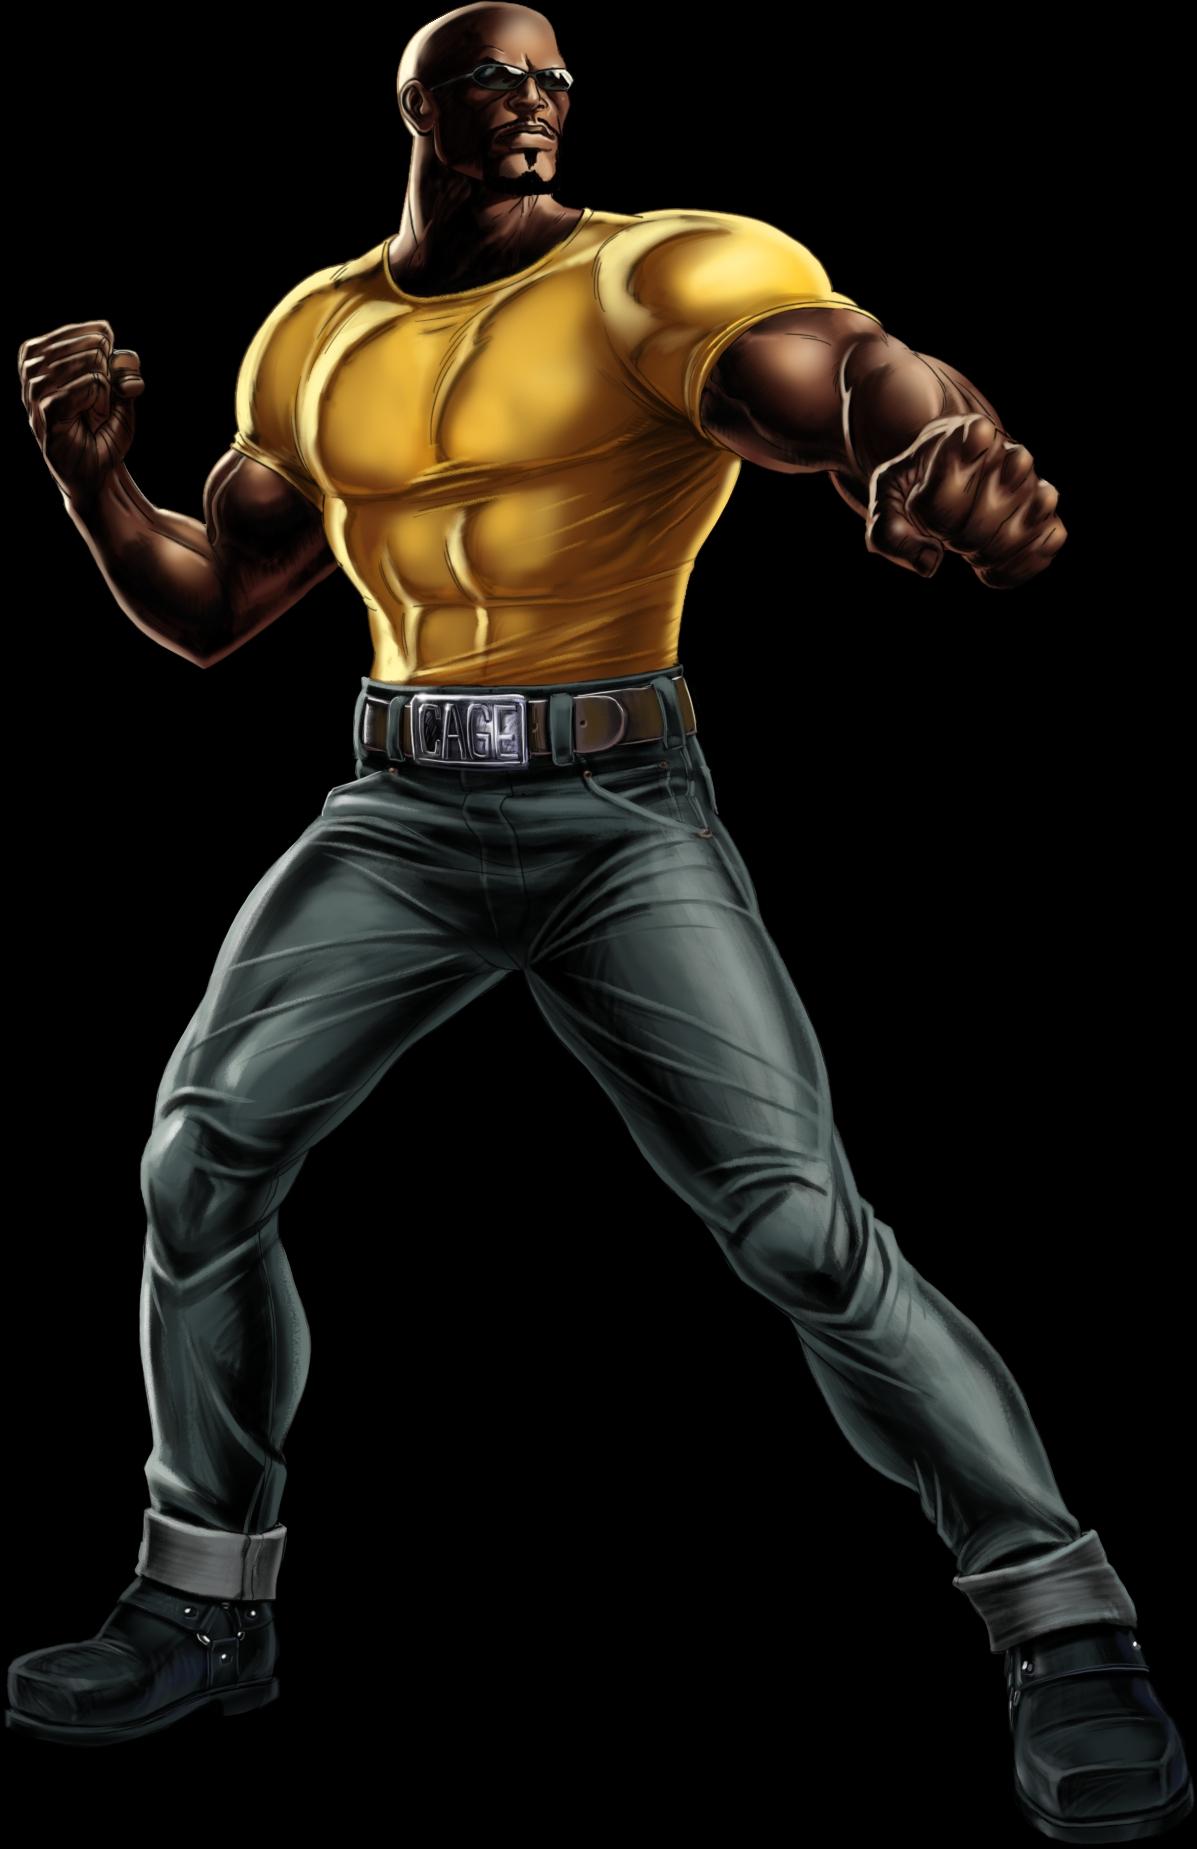 Luke Cage Marvel Wallpaper wwwpixsharkcom   Images 1197x1849